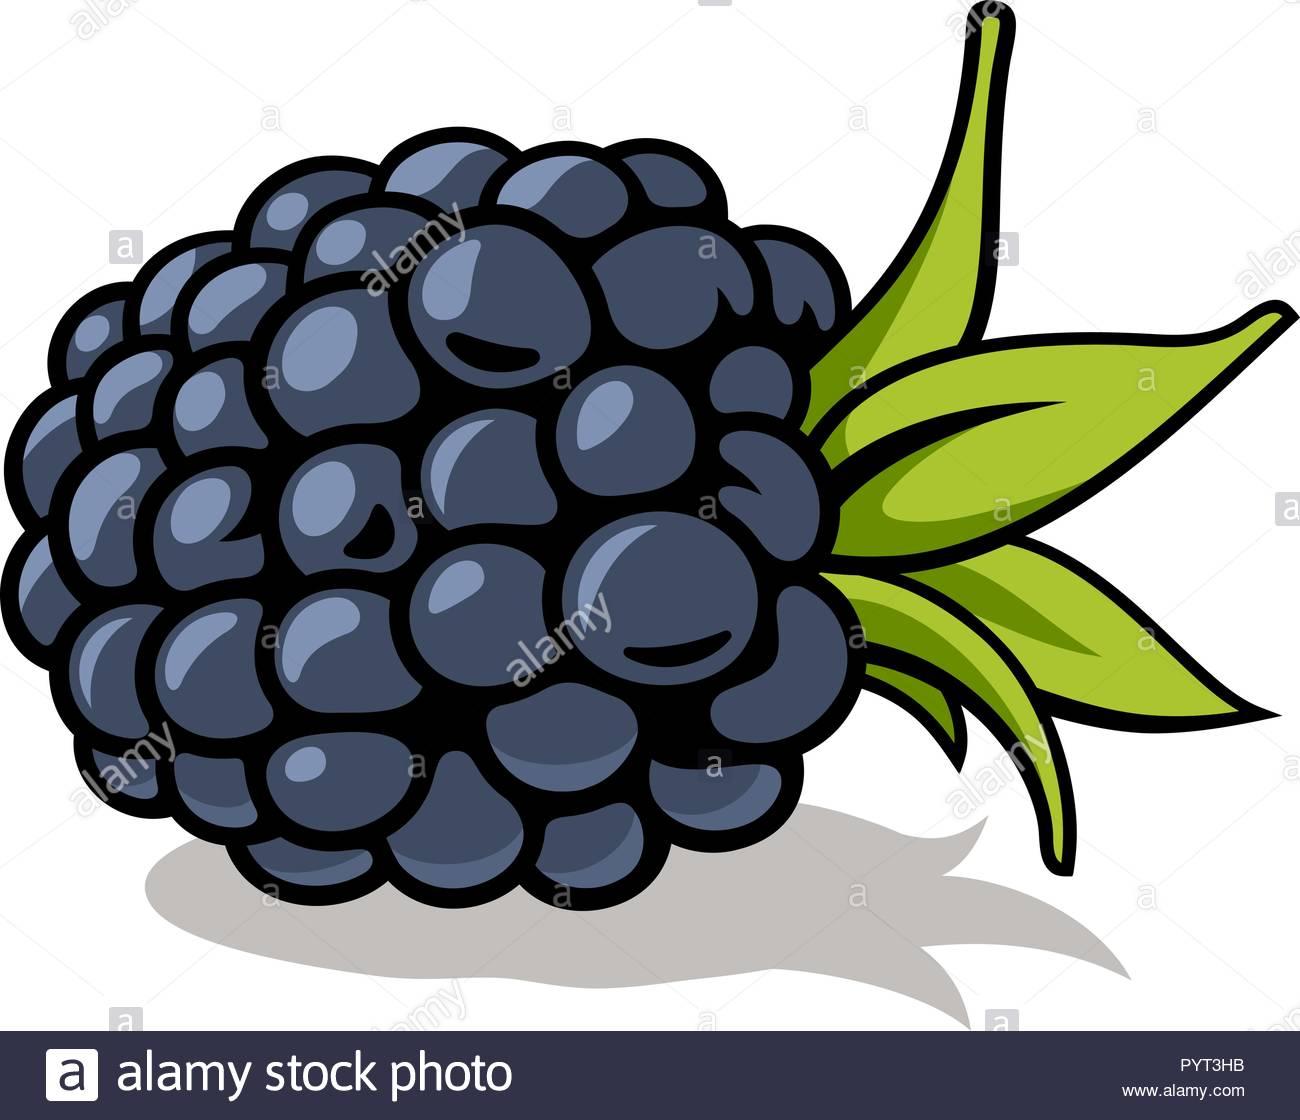 Vector illustration of fresh, ripe blackberry with green.